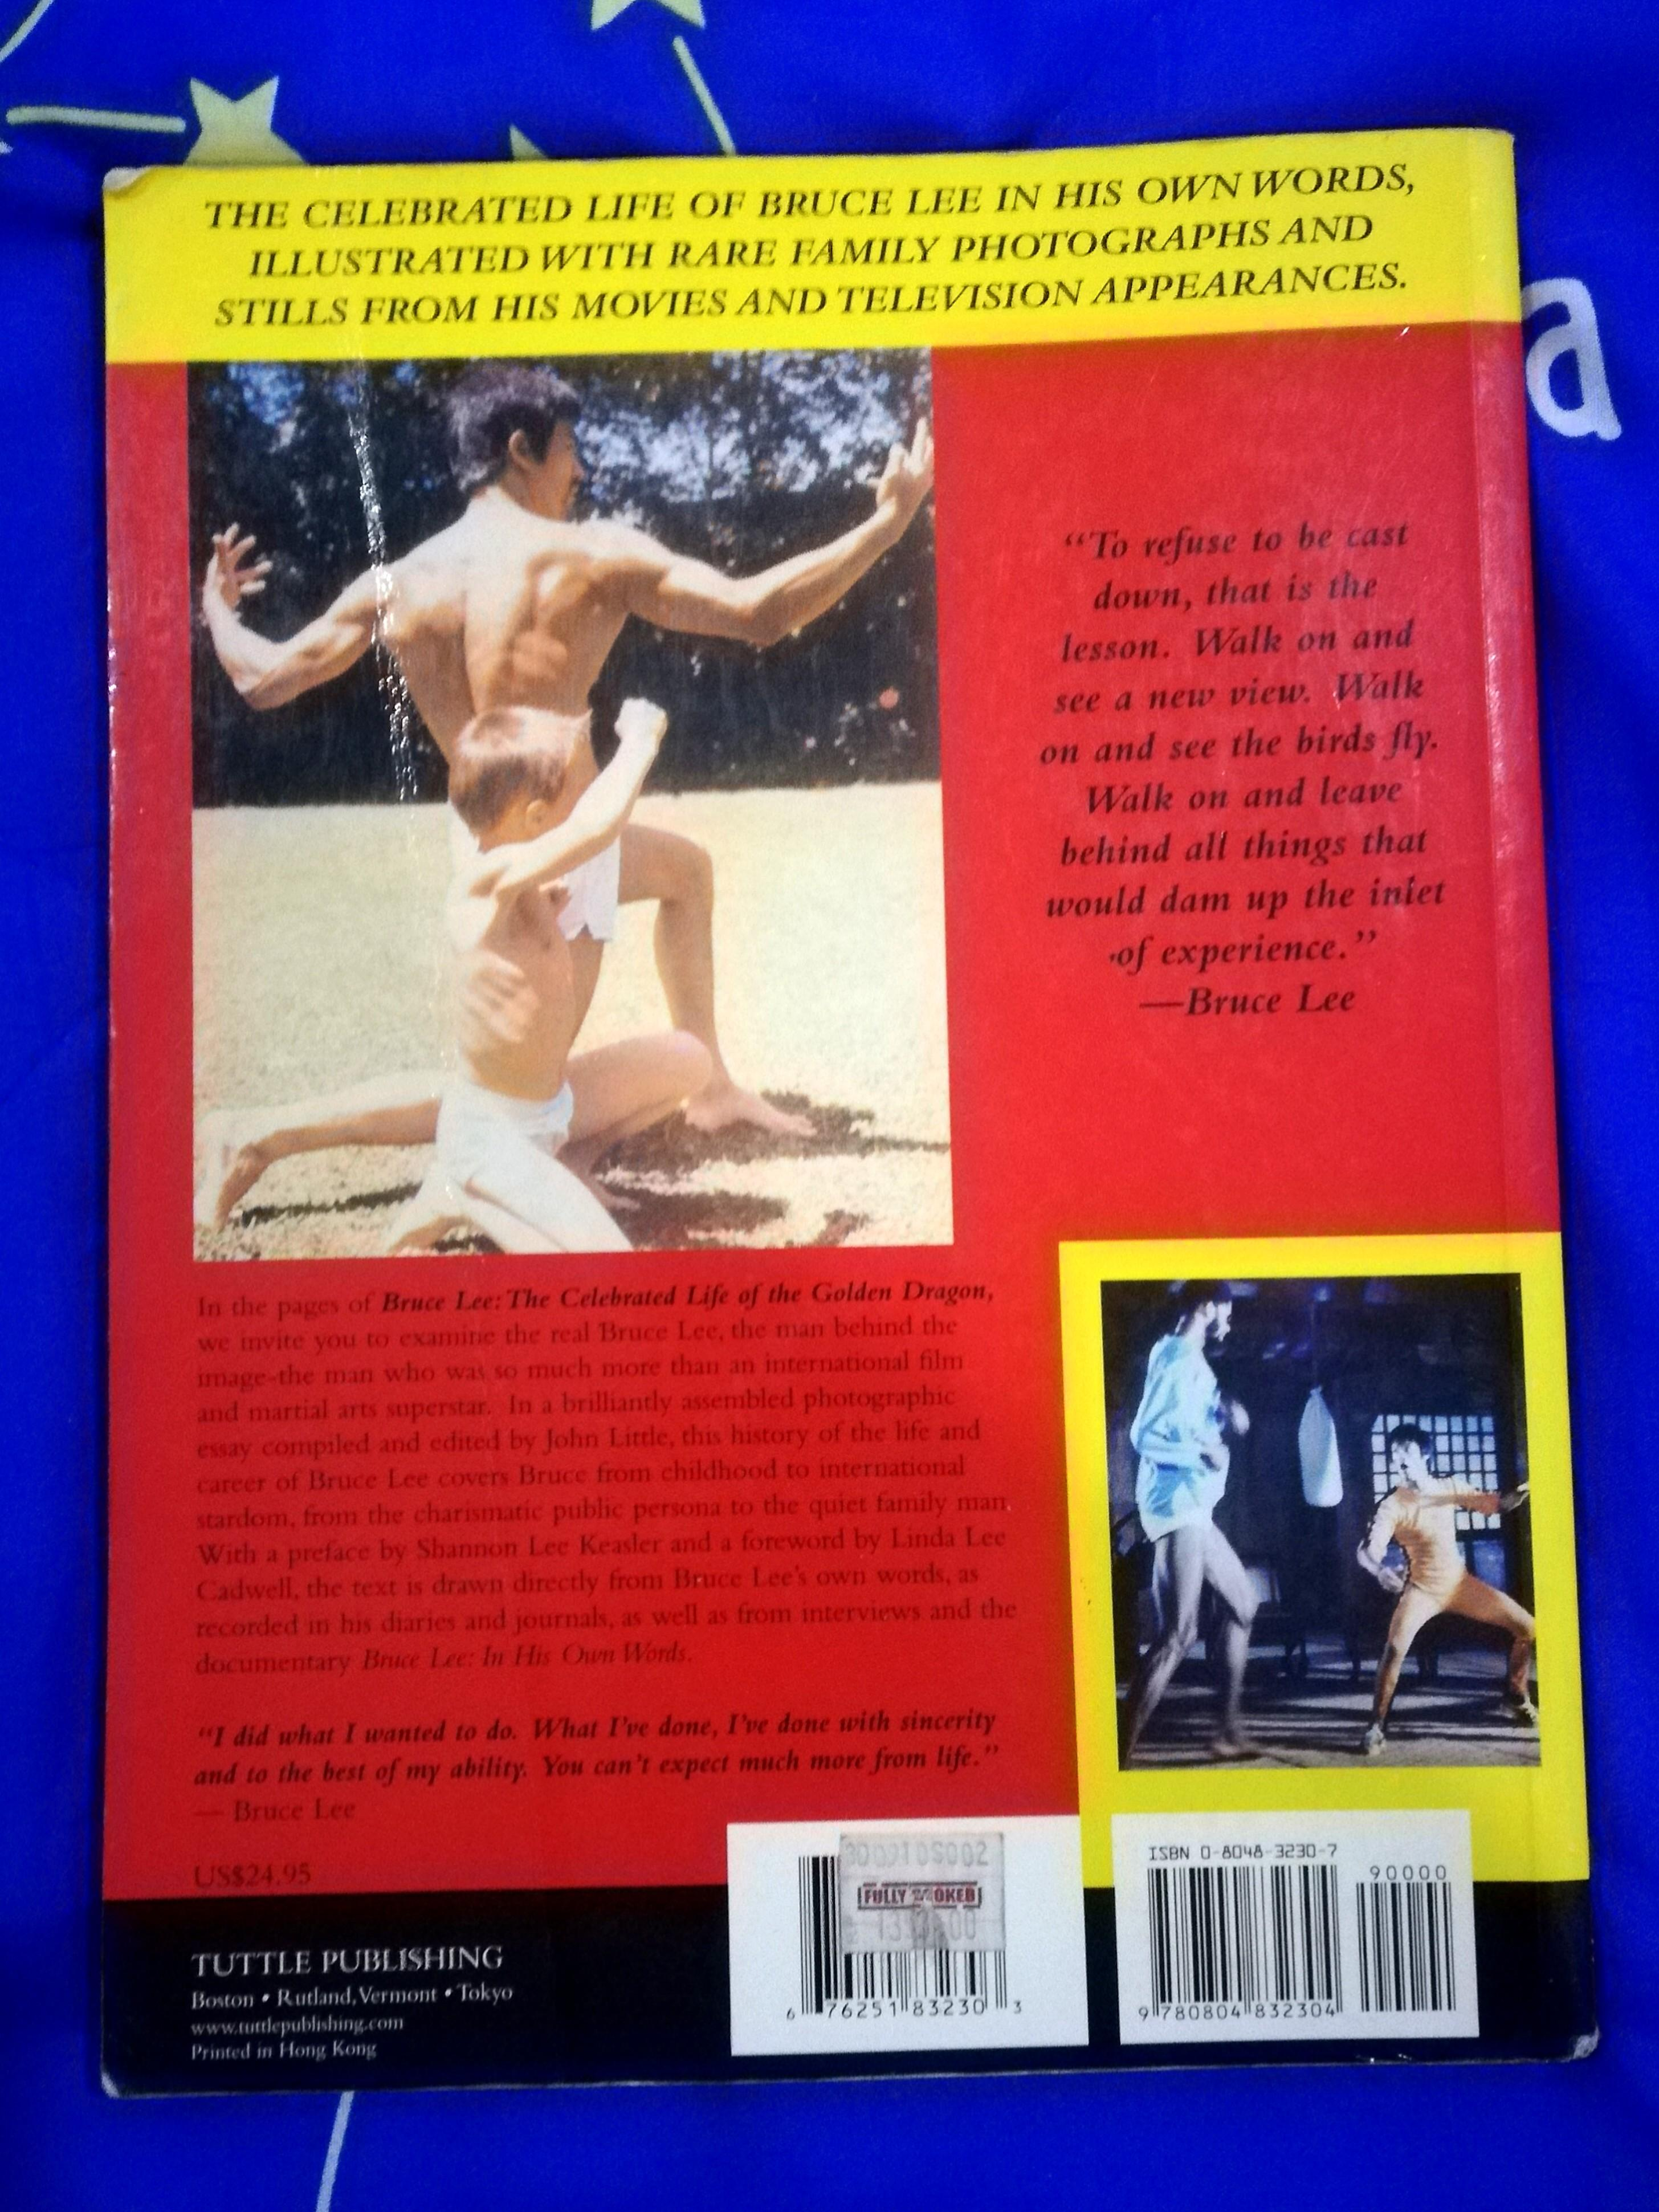 (Award Winning Documentary Based!!) Bruce Lee - The Celebrated Life of the Golden Dragon